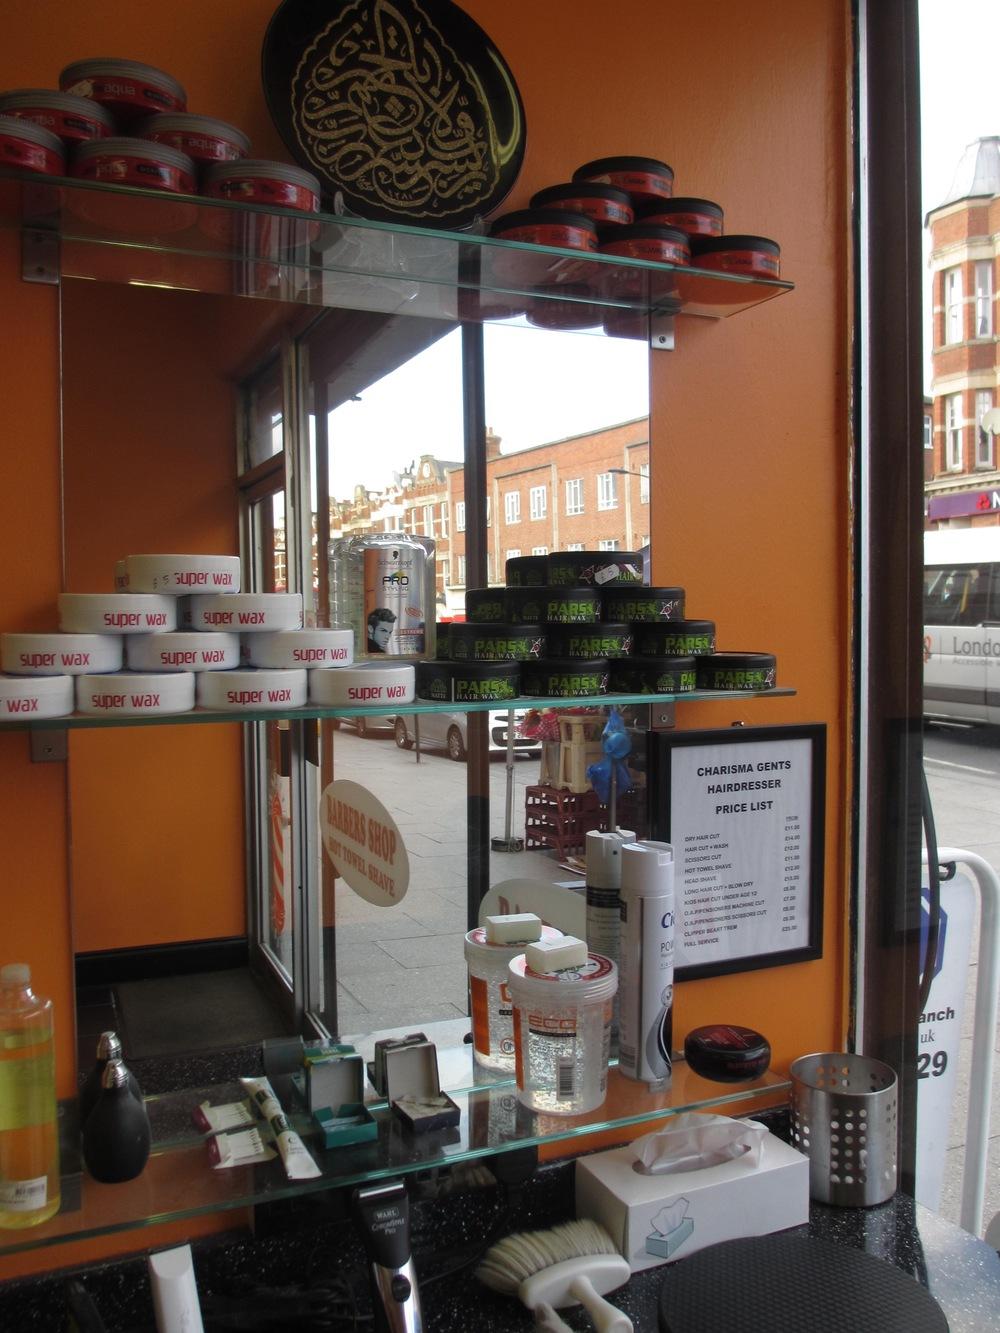 Charisma Barber shop in Sydenham South London Club